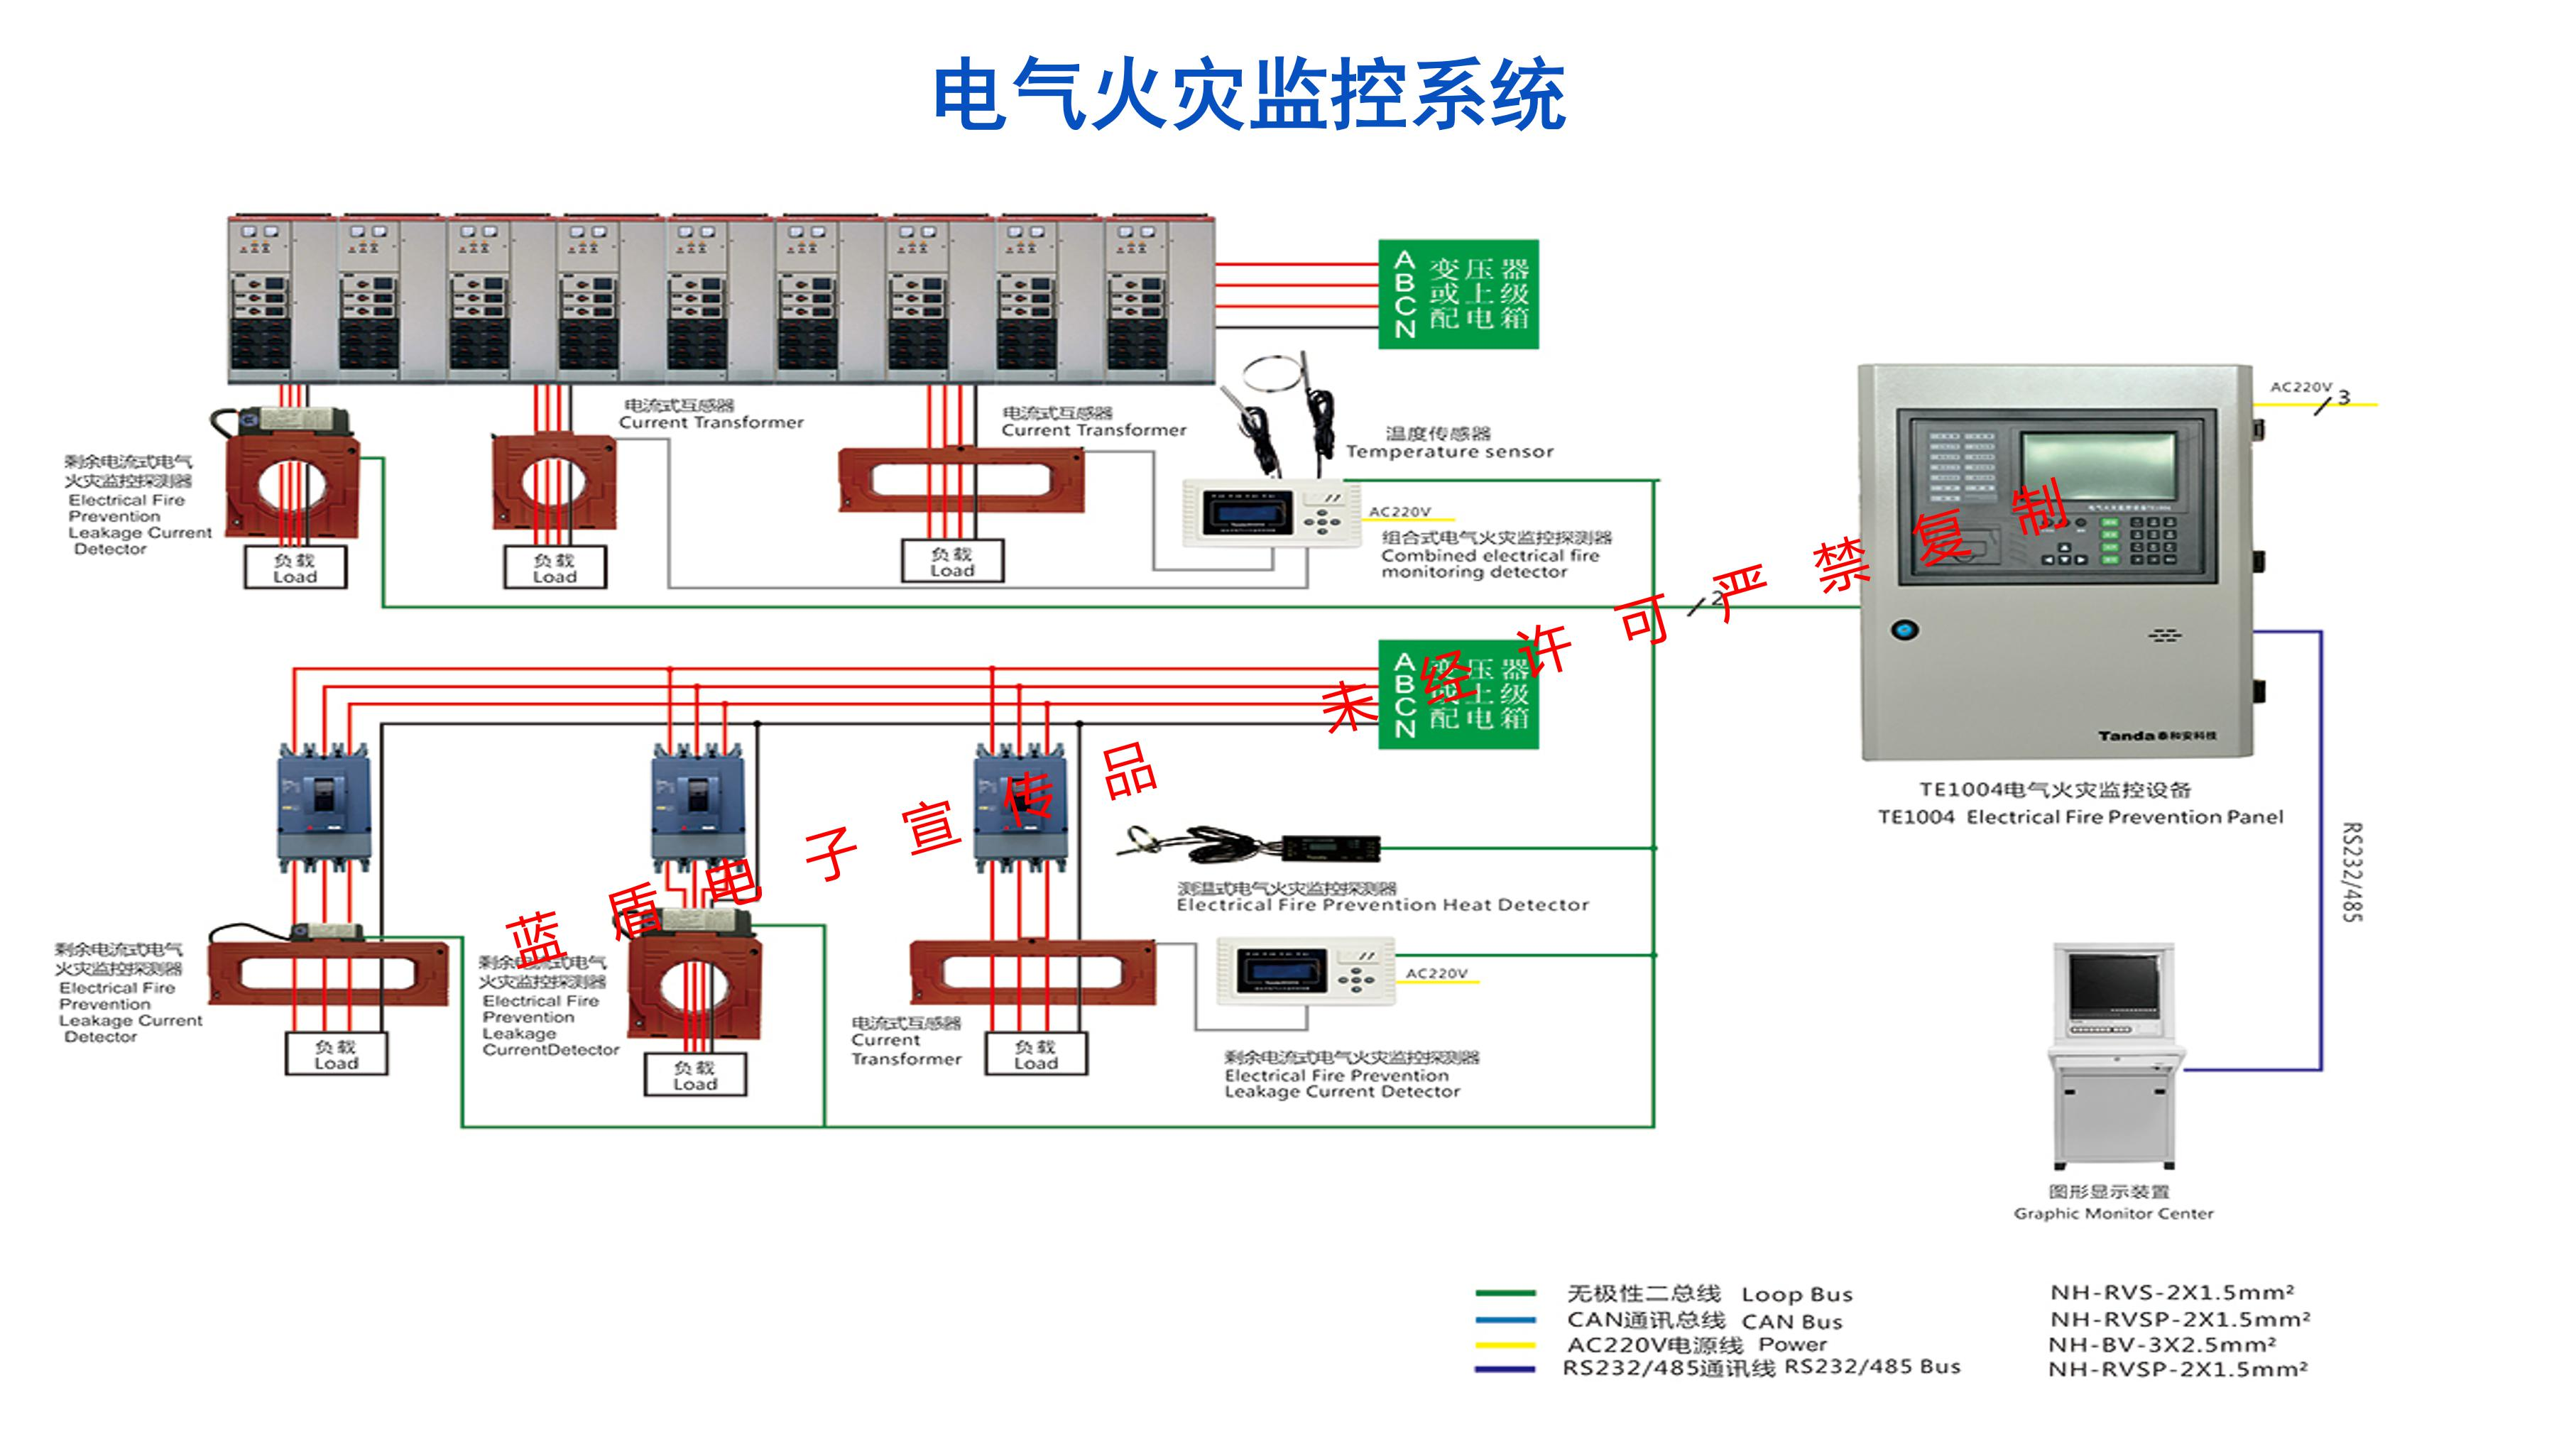 betway体育官网下载设施工程文案_03.jpg